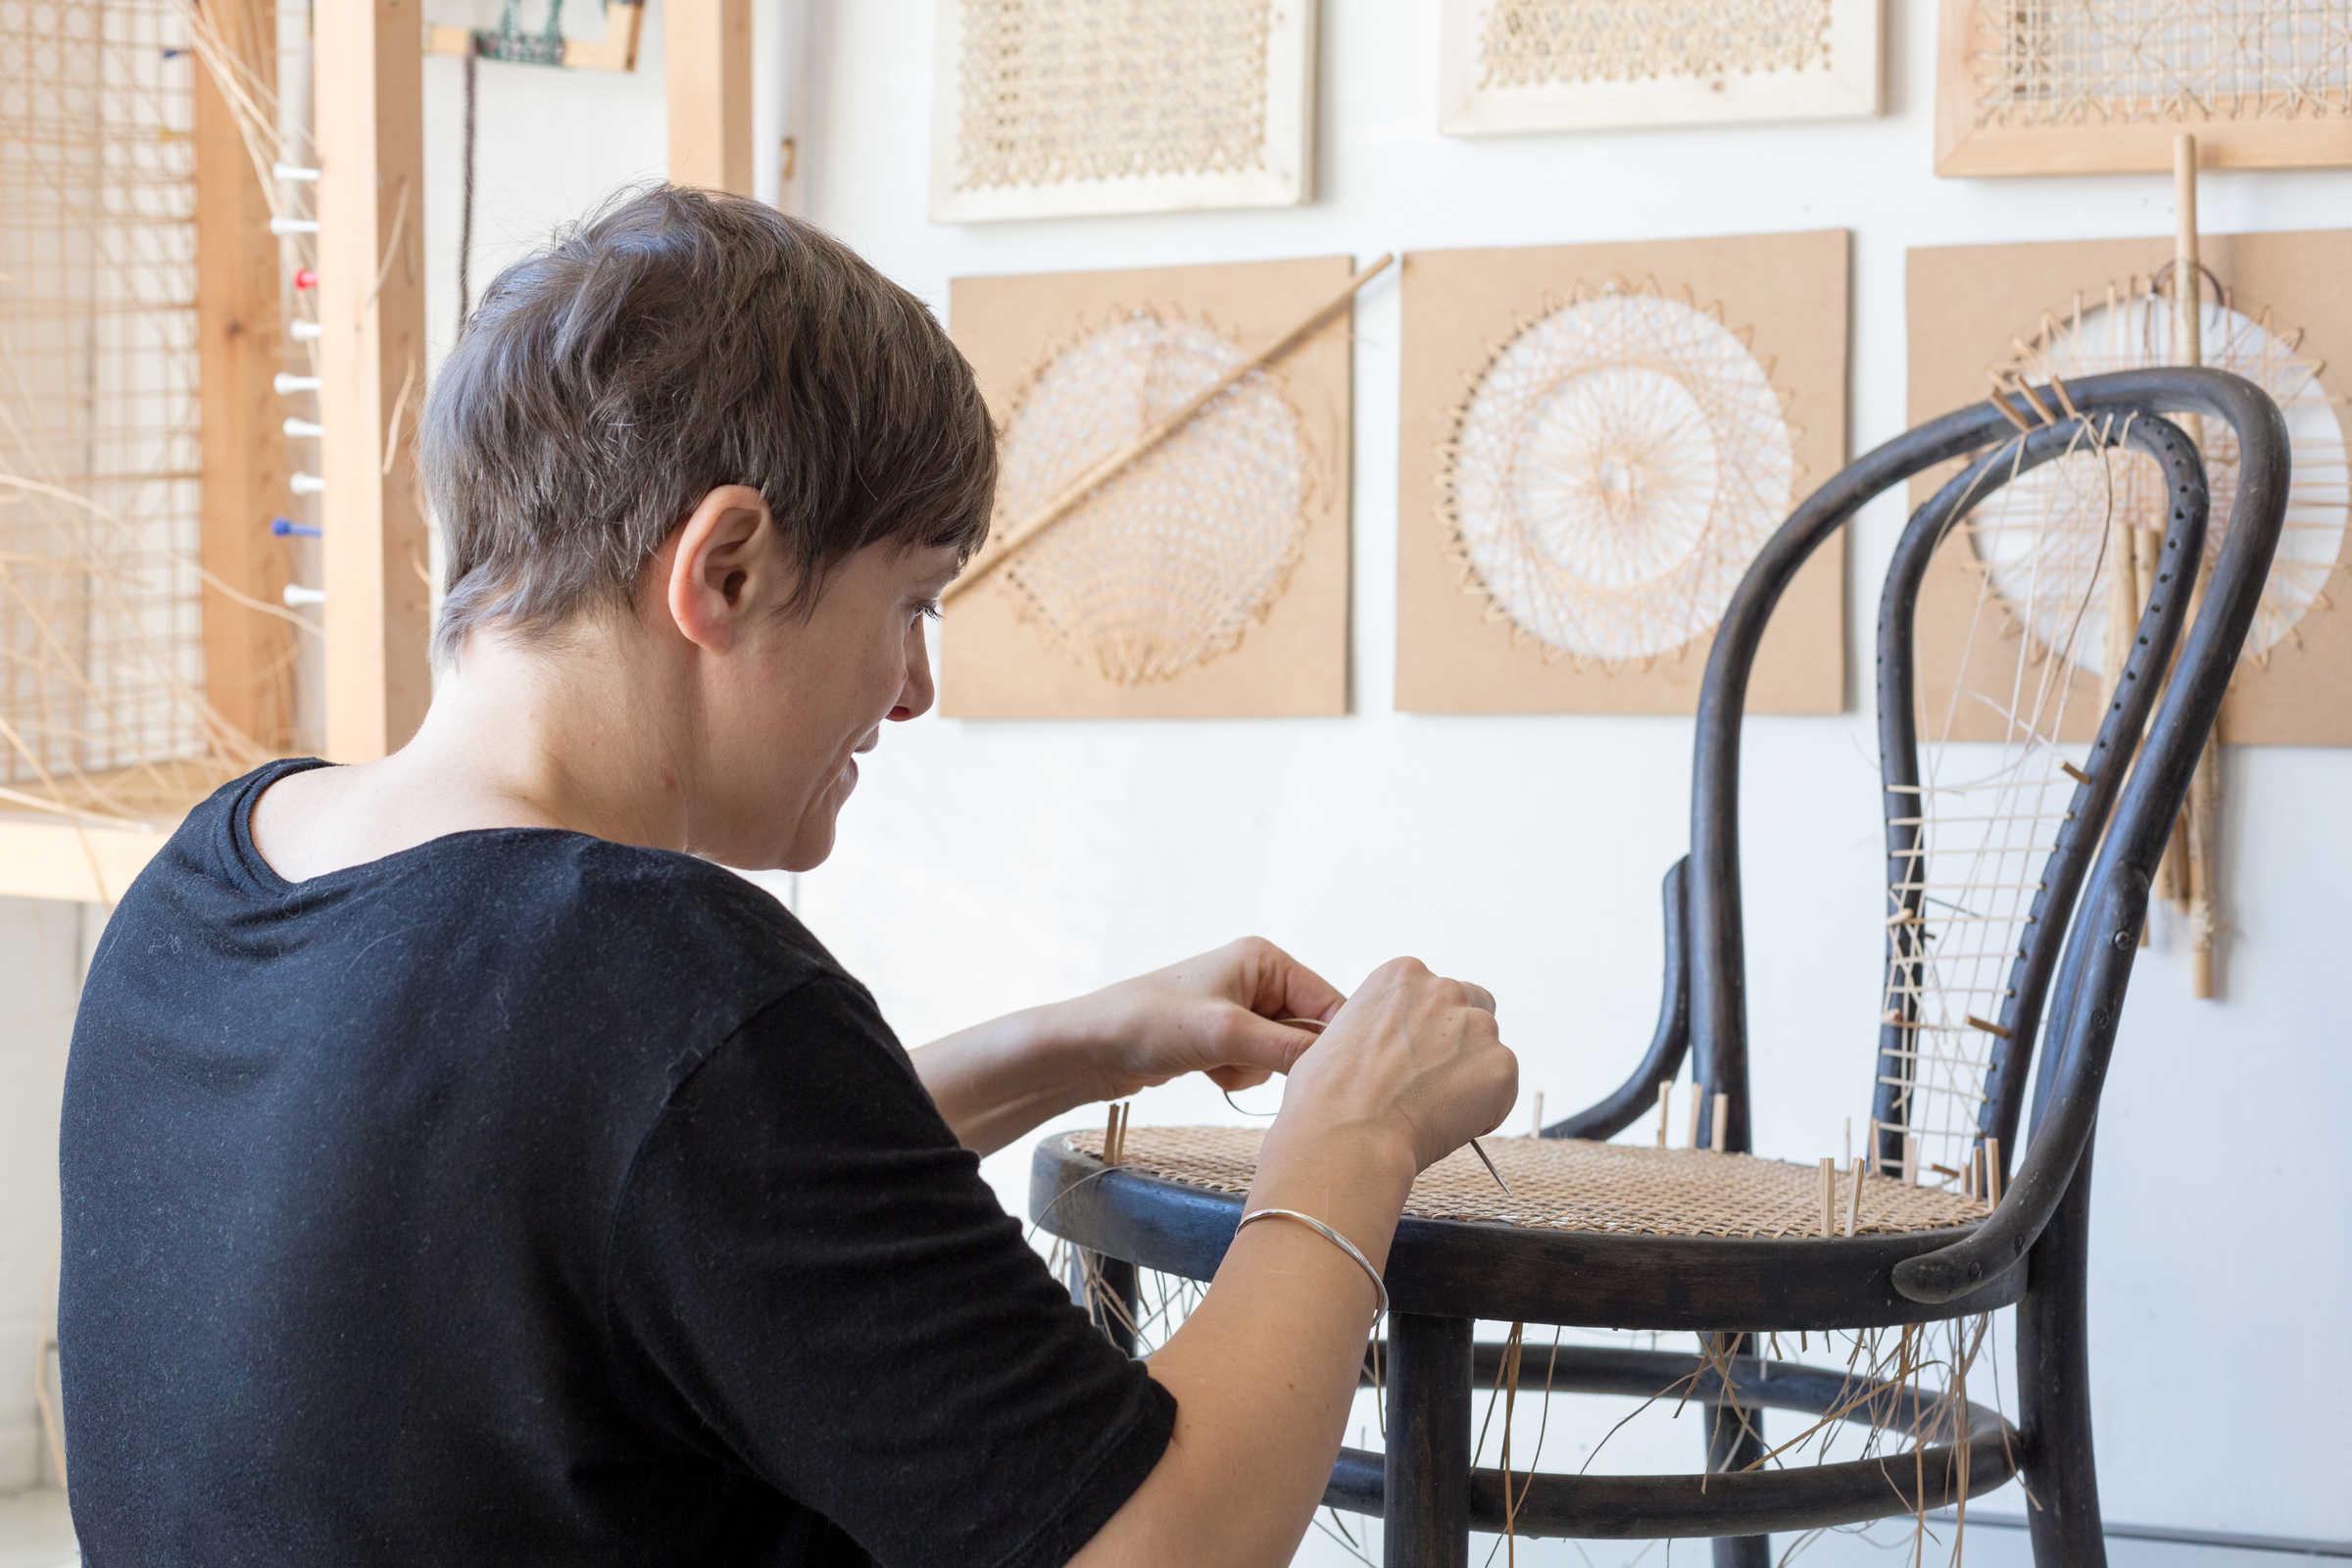 Heal's-modern-craft-market-made-in-london-rachel-south